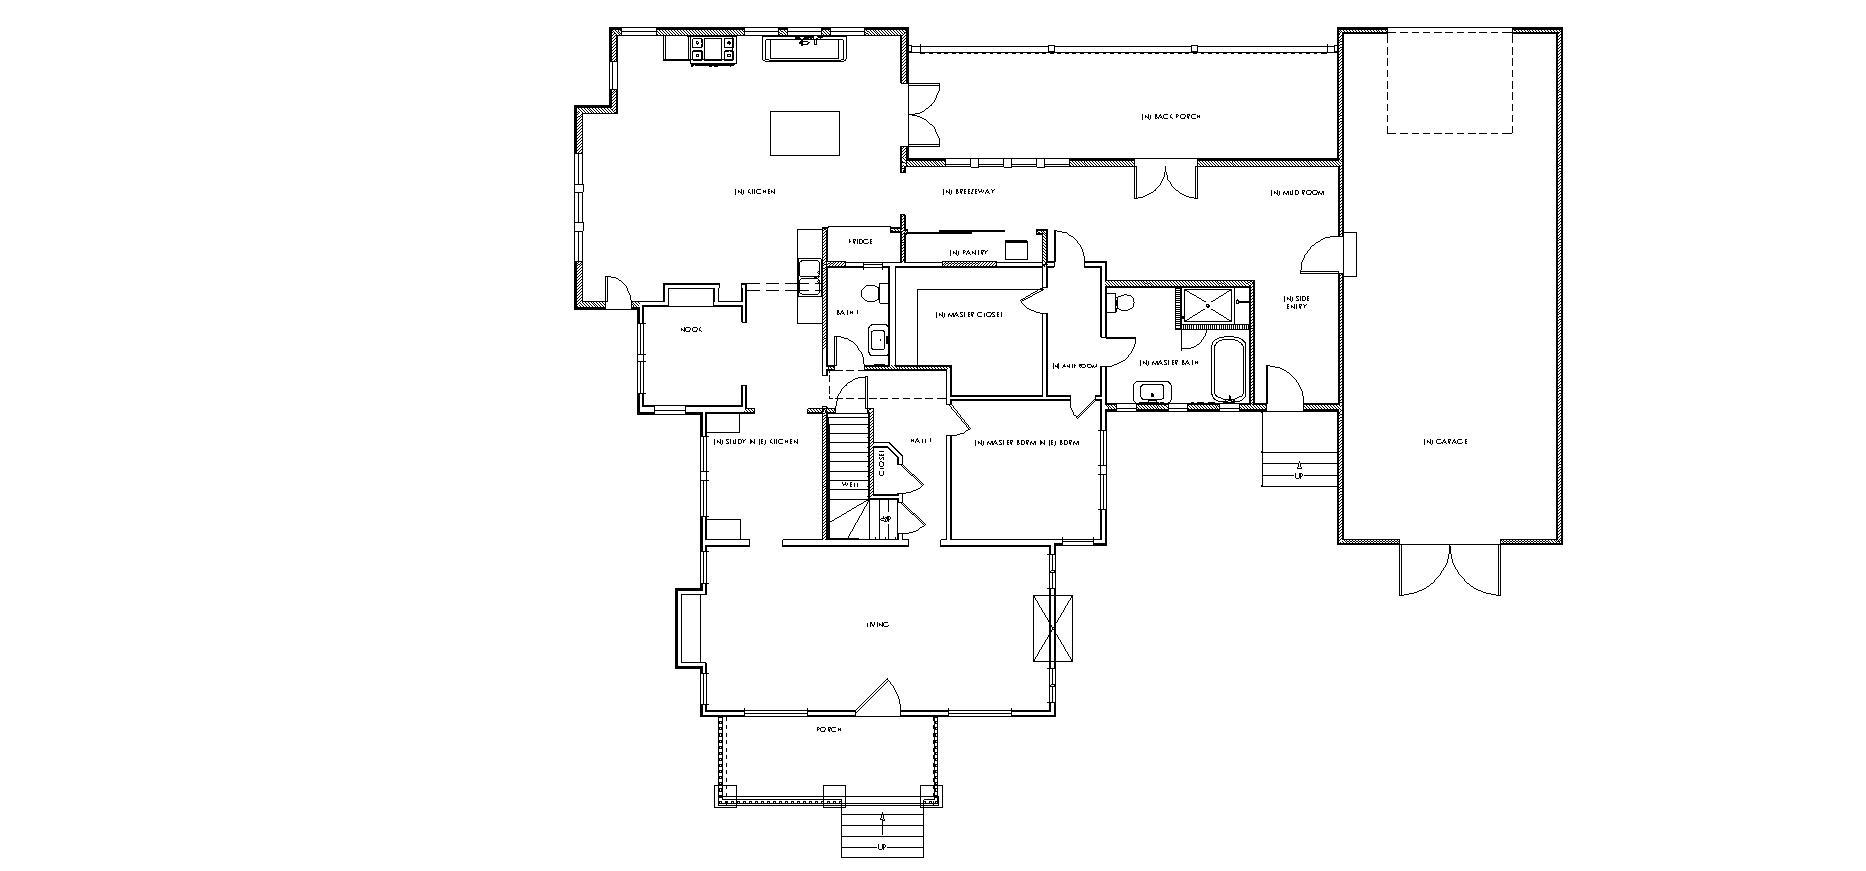 Portland Design Build together with Castle Floor Plans Himeji Plan as well Himeji Castle Snow in addition 44442642 furthermore Himeji Castle Clip Art. on matsumoto castle floor plan